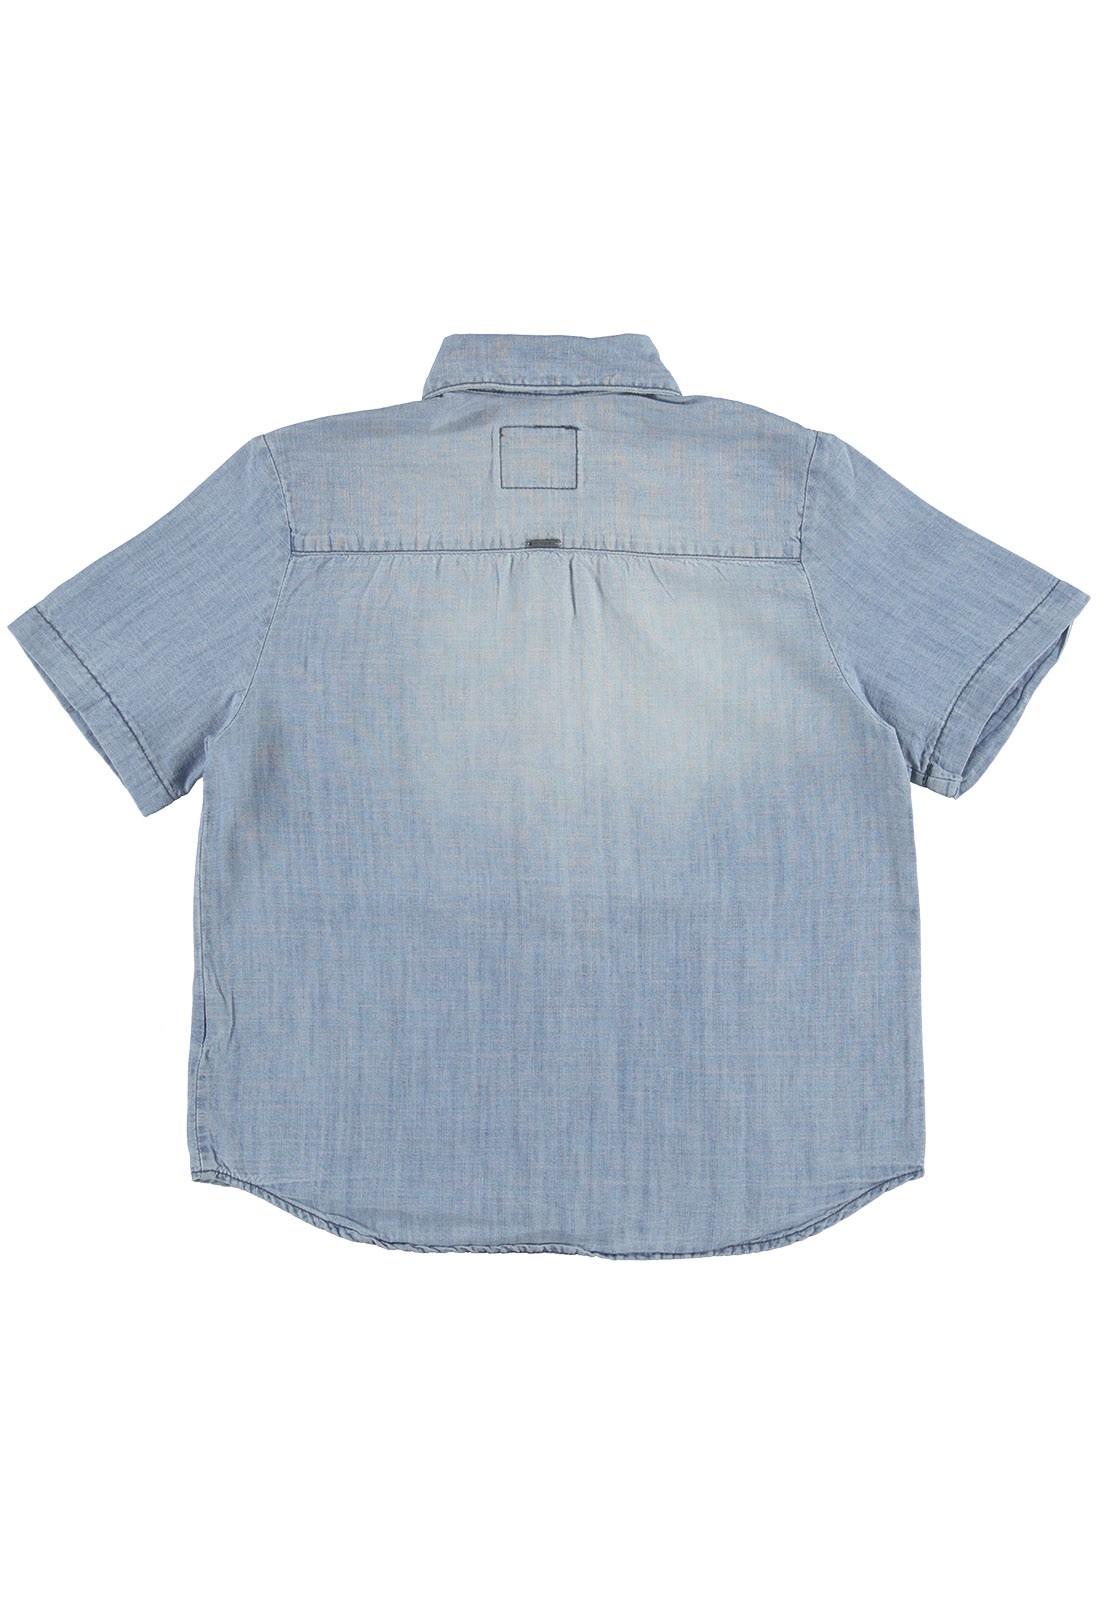 Camisa Crawling Manga Curta Masculina